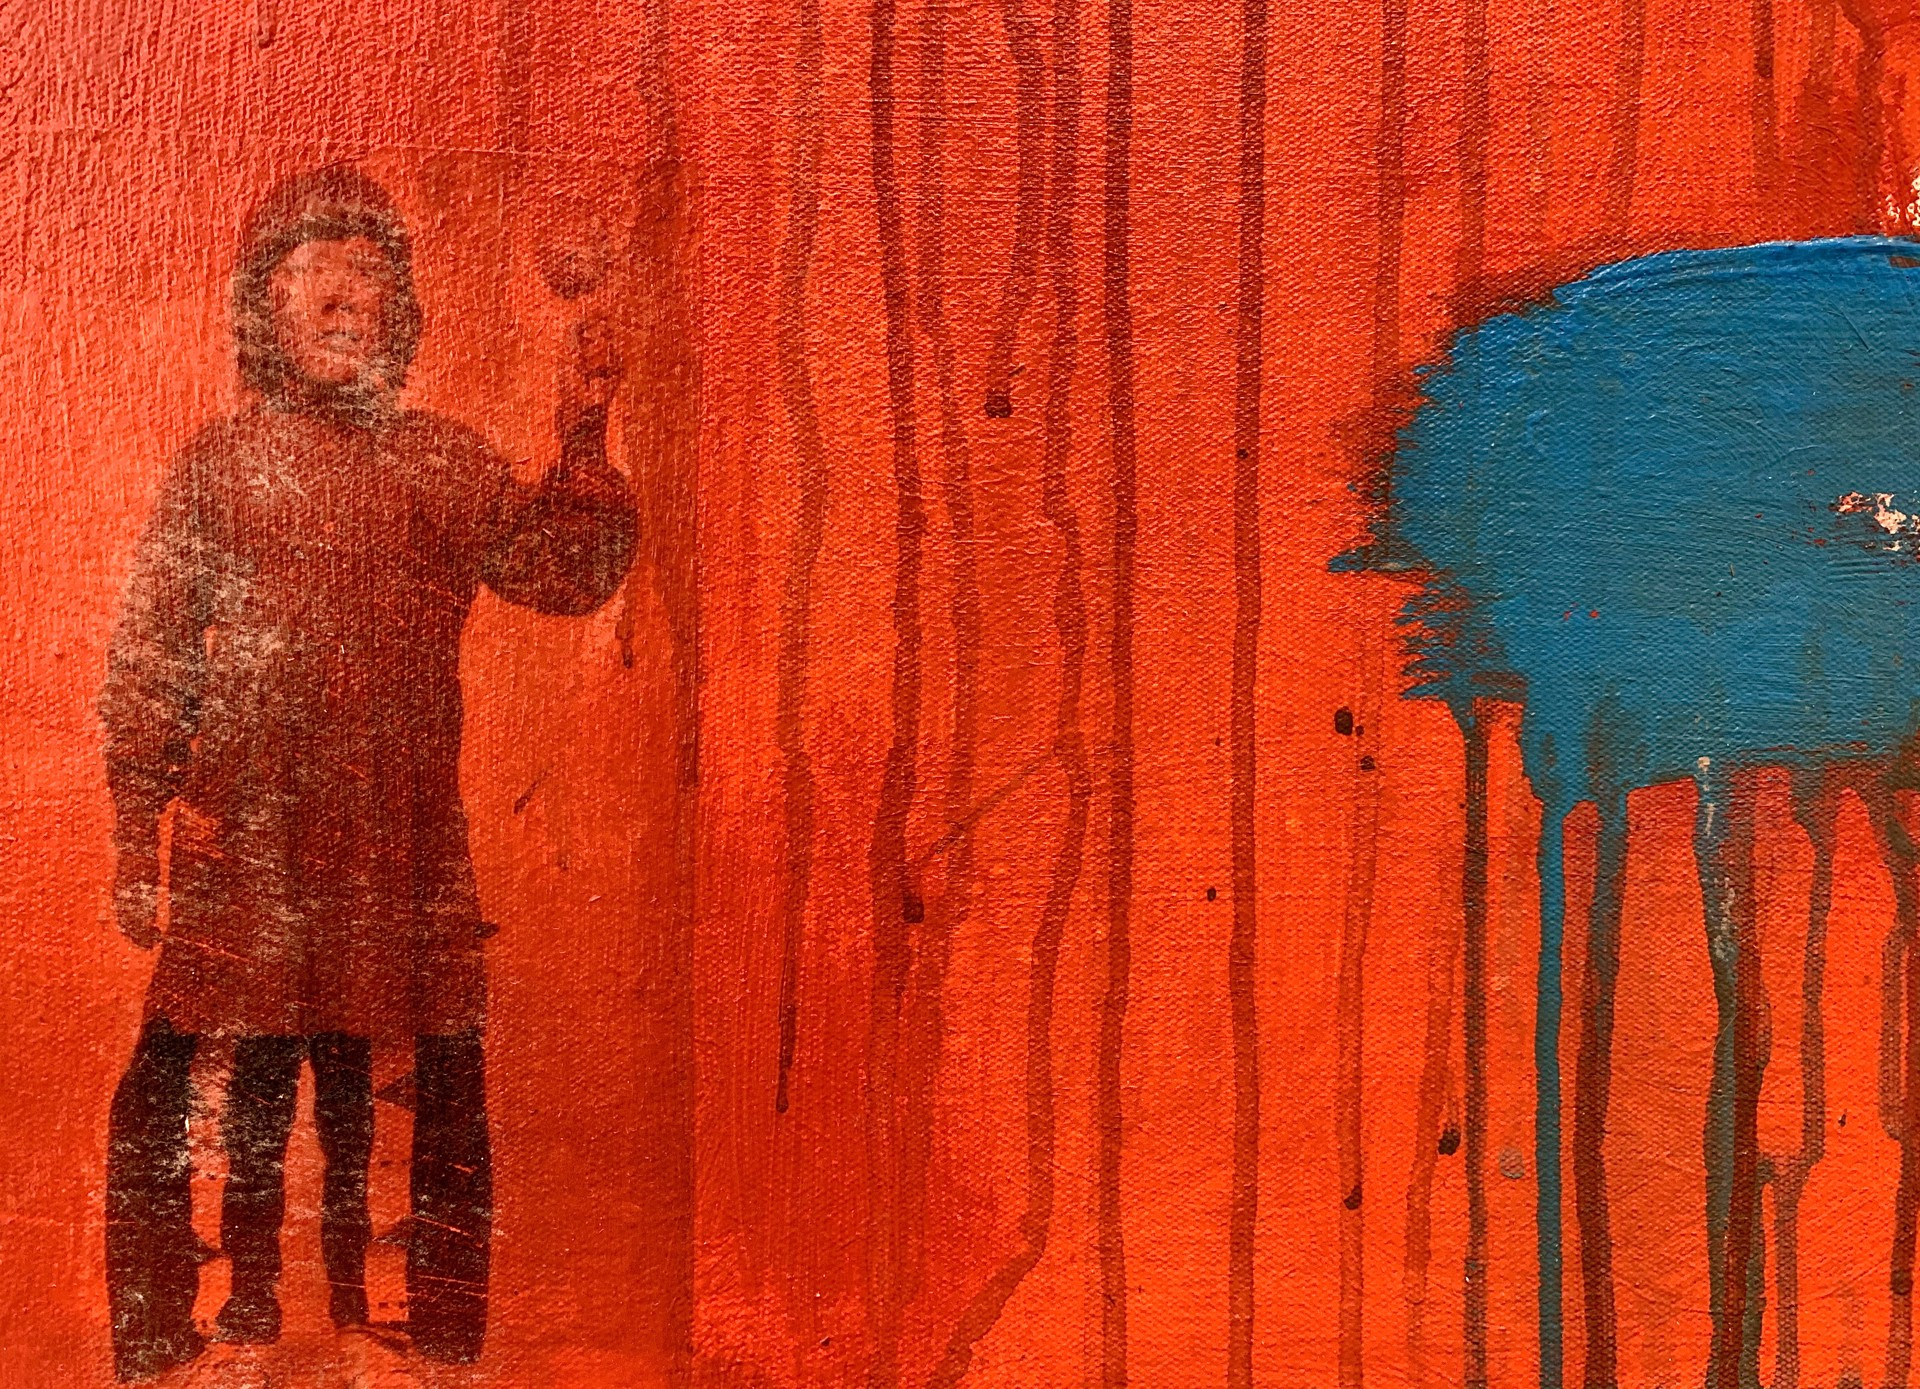 COLONIALGORITHM by John Yoyogi Fortes